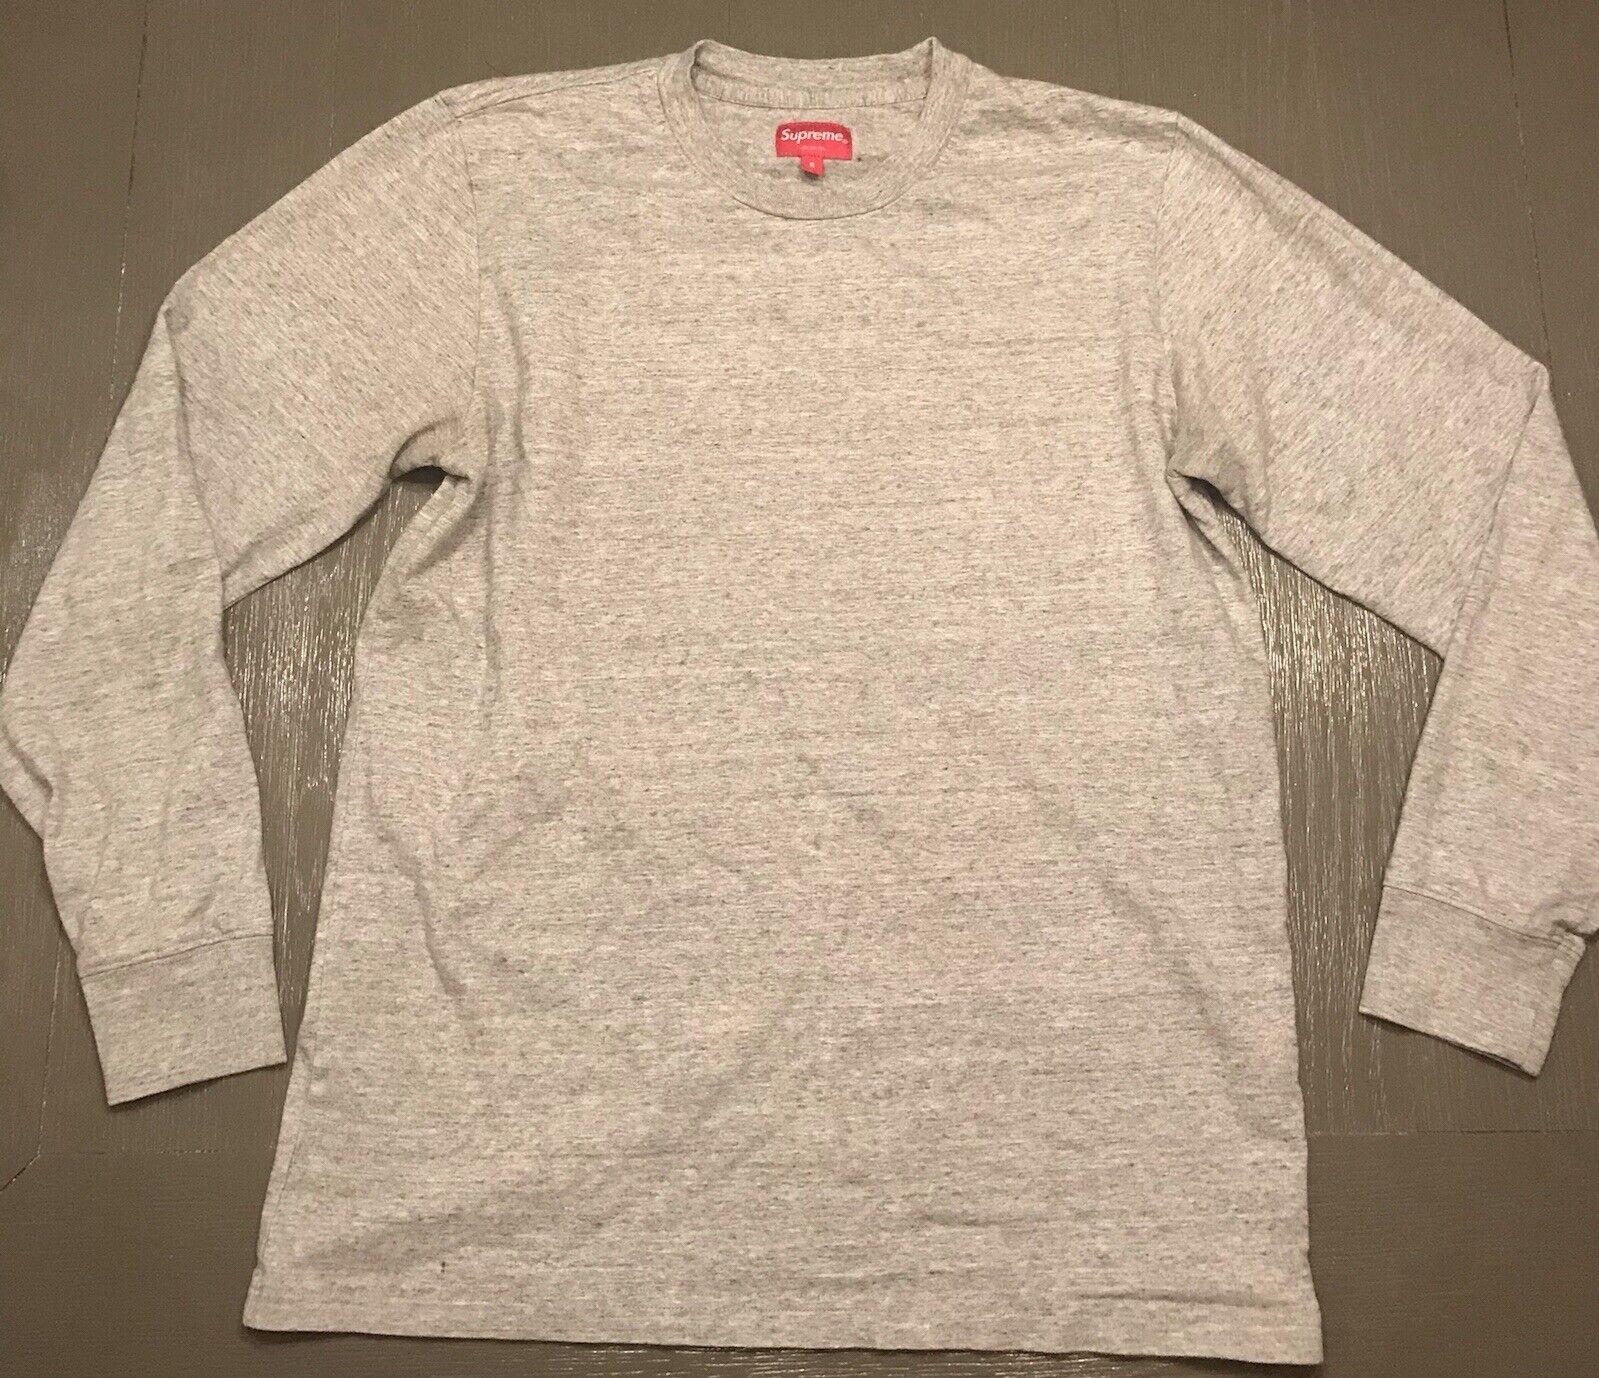 supreme long sleeve t shirt  - image 1